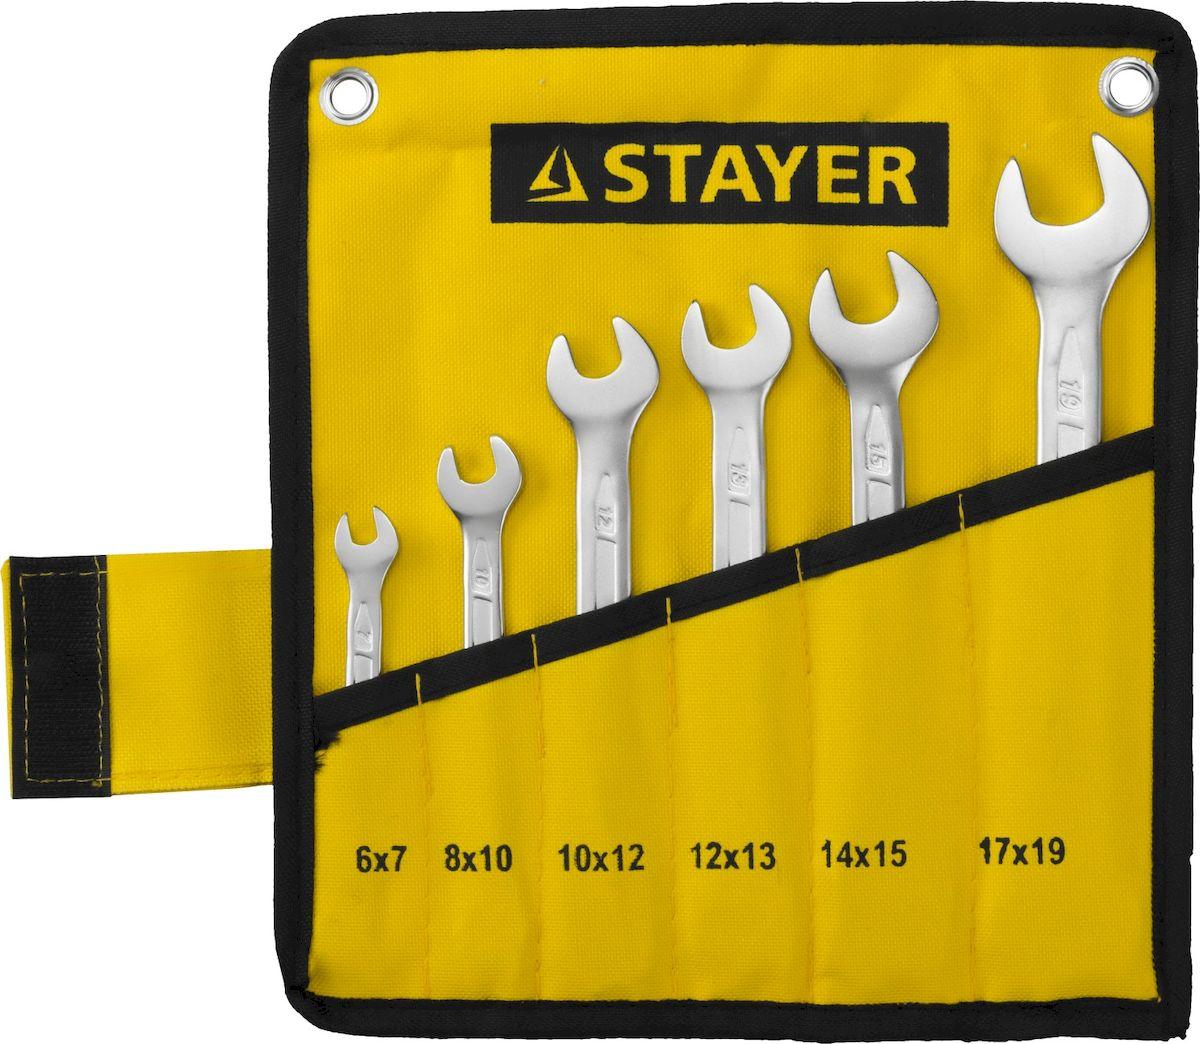 Набор рожковых гаечных ключей Stayer Profi, 6-19мм, 6шт27035-H6Набор: Ключ STAYER PROFI гаечный рожковый, Cr-V сталь, хромированный, 6-19мм, 6шт